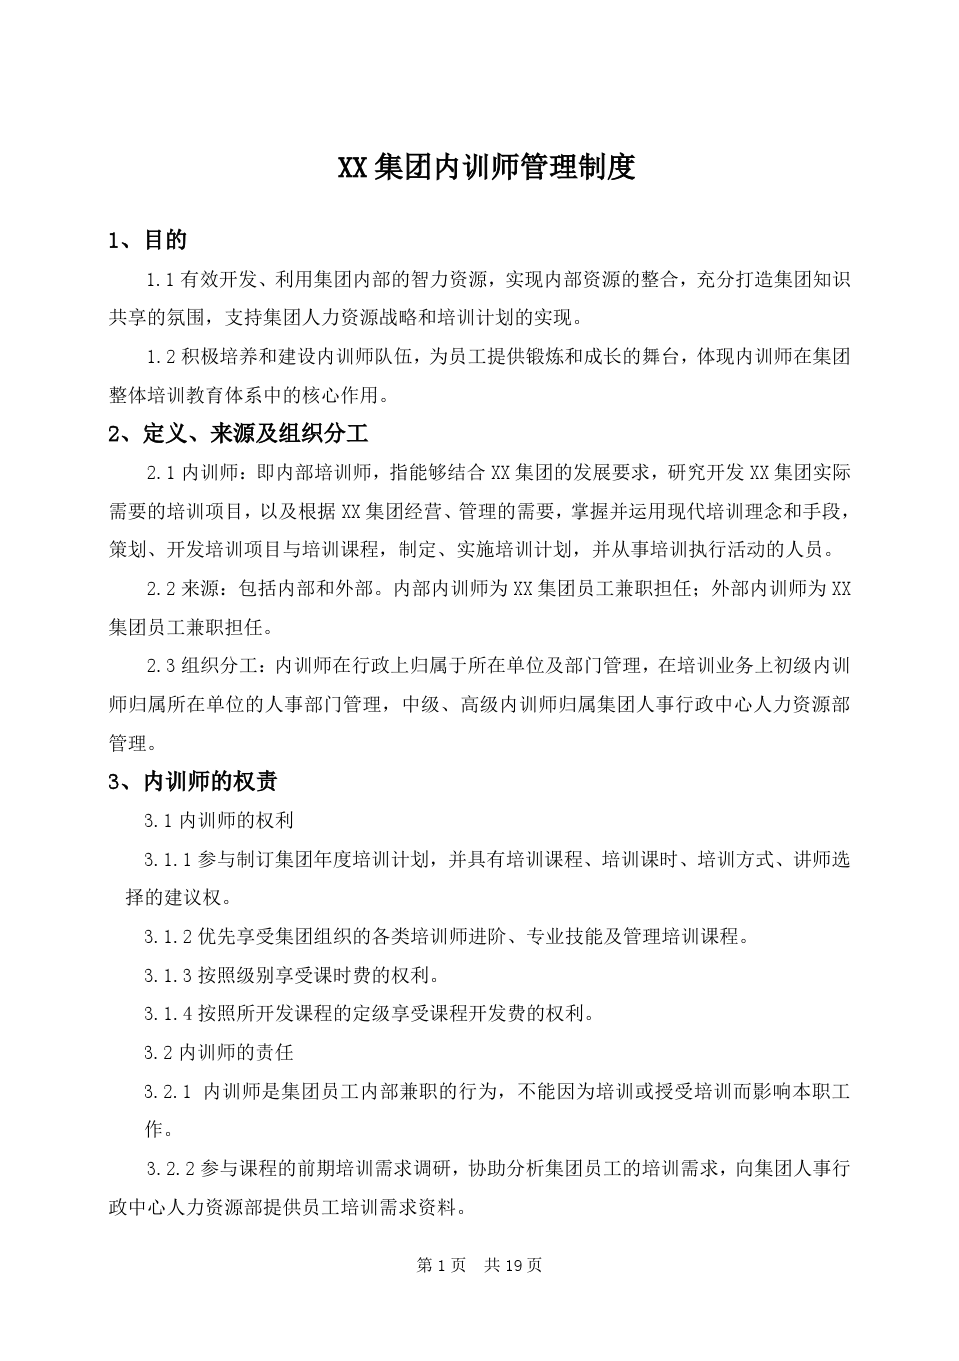 XX集团内训师管理制度